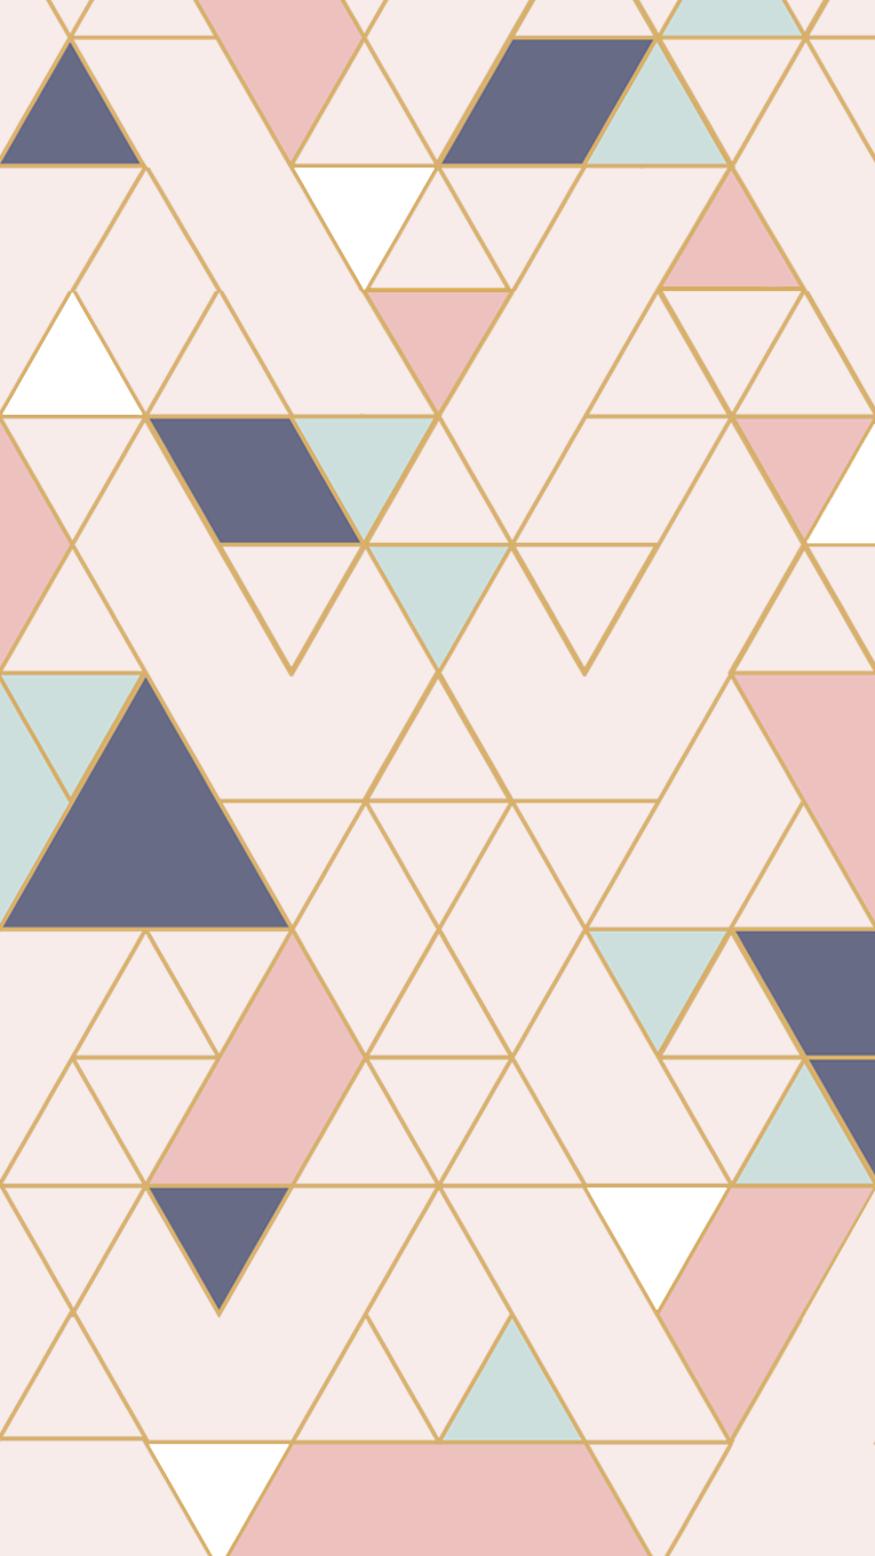 Wallpaper Mosaicos By Gocase Pastel Pink Wallpaper Iphone Wallpaper Pattern Pink Wallpaper Iphone